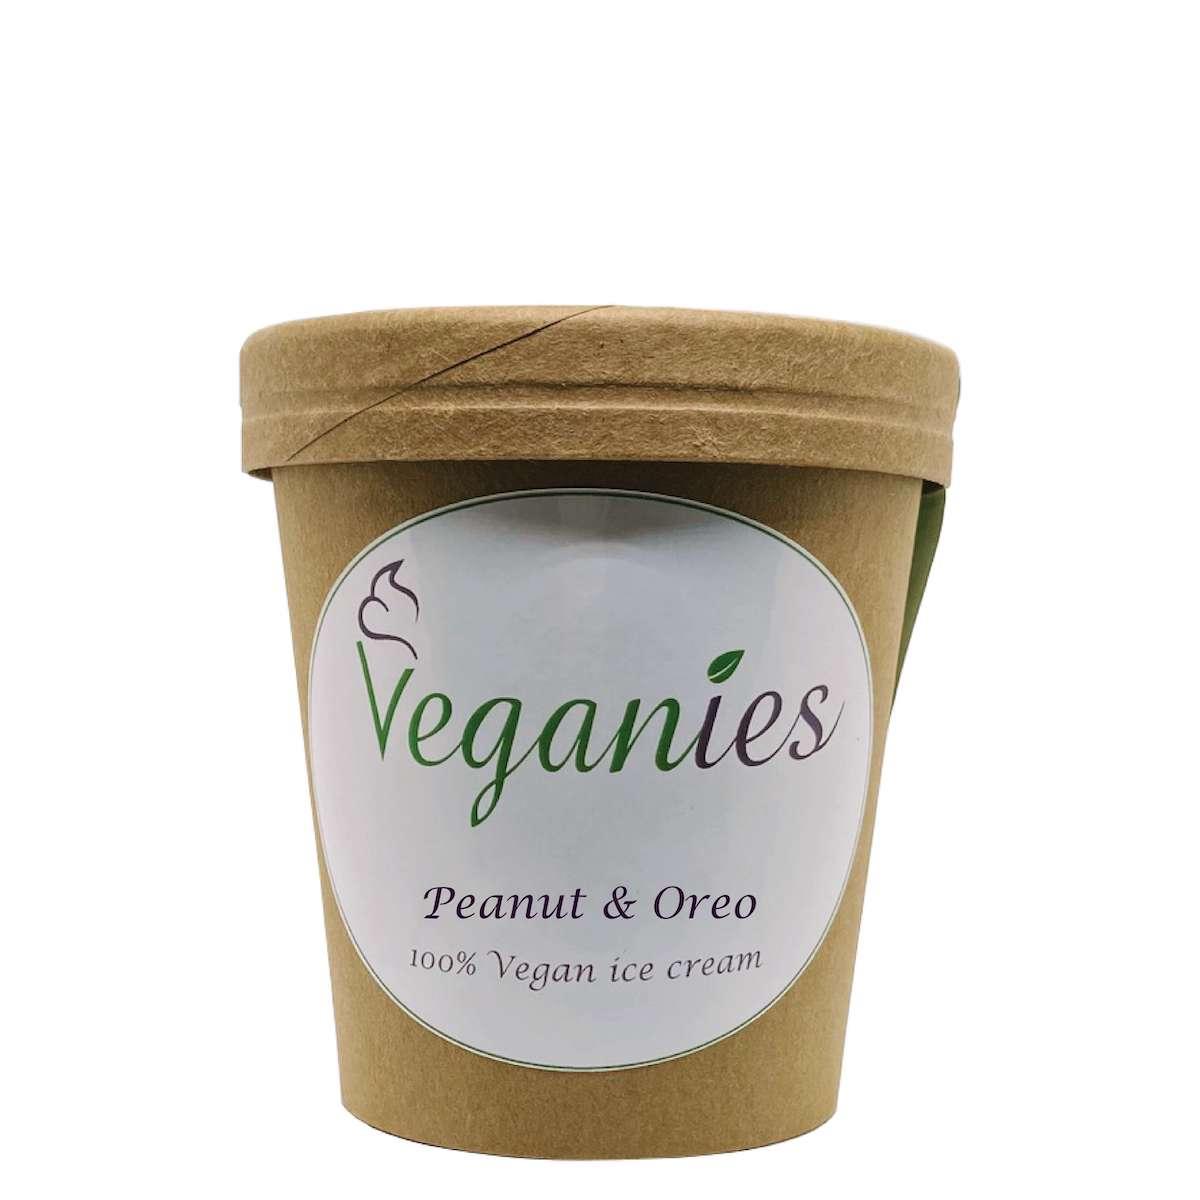 Vegan ijs Peanut & Oreo